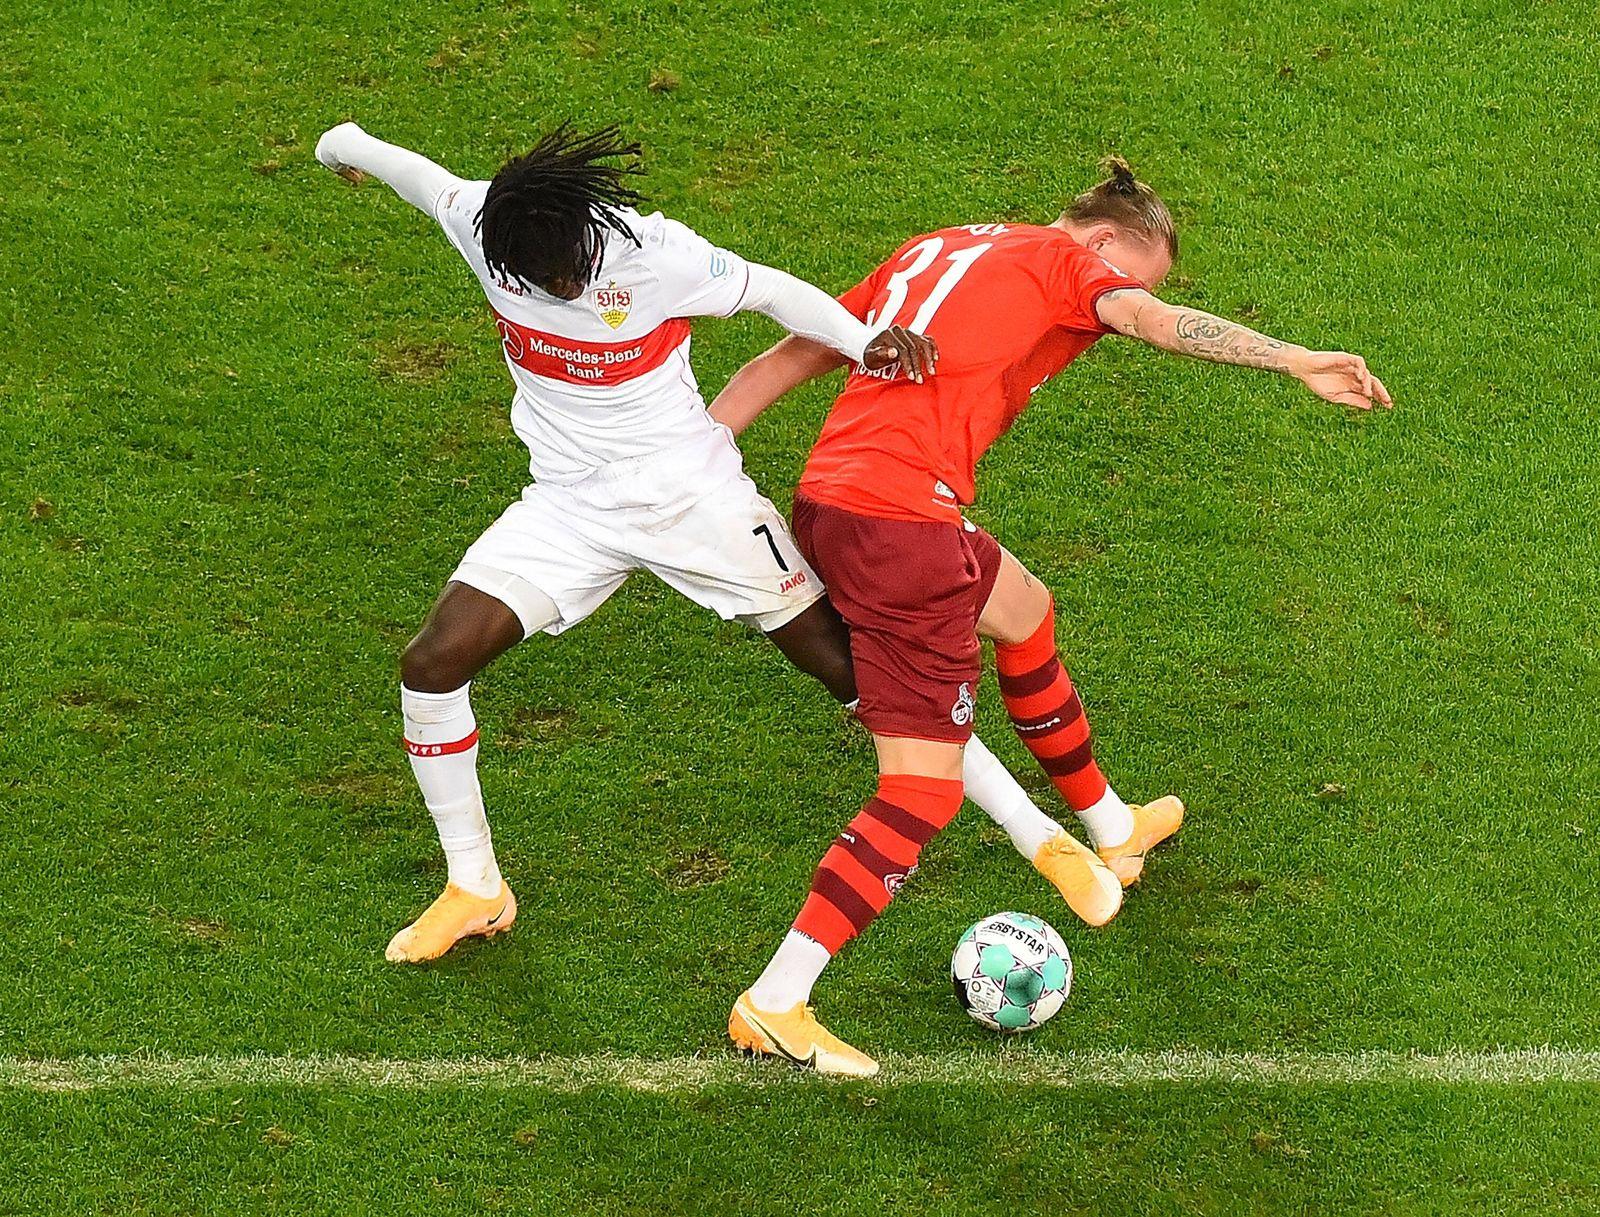 23.10.2020, xhbx, Fussball 1.Bundesliga, VfB Stuttgart - 1.FC Koeln emspor, v.l. Tanguy Coulibaly (VfB Stuttgart), Mariu